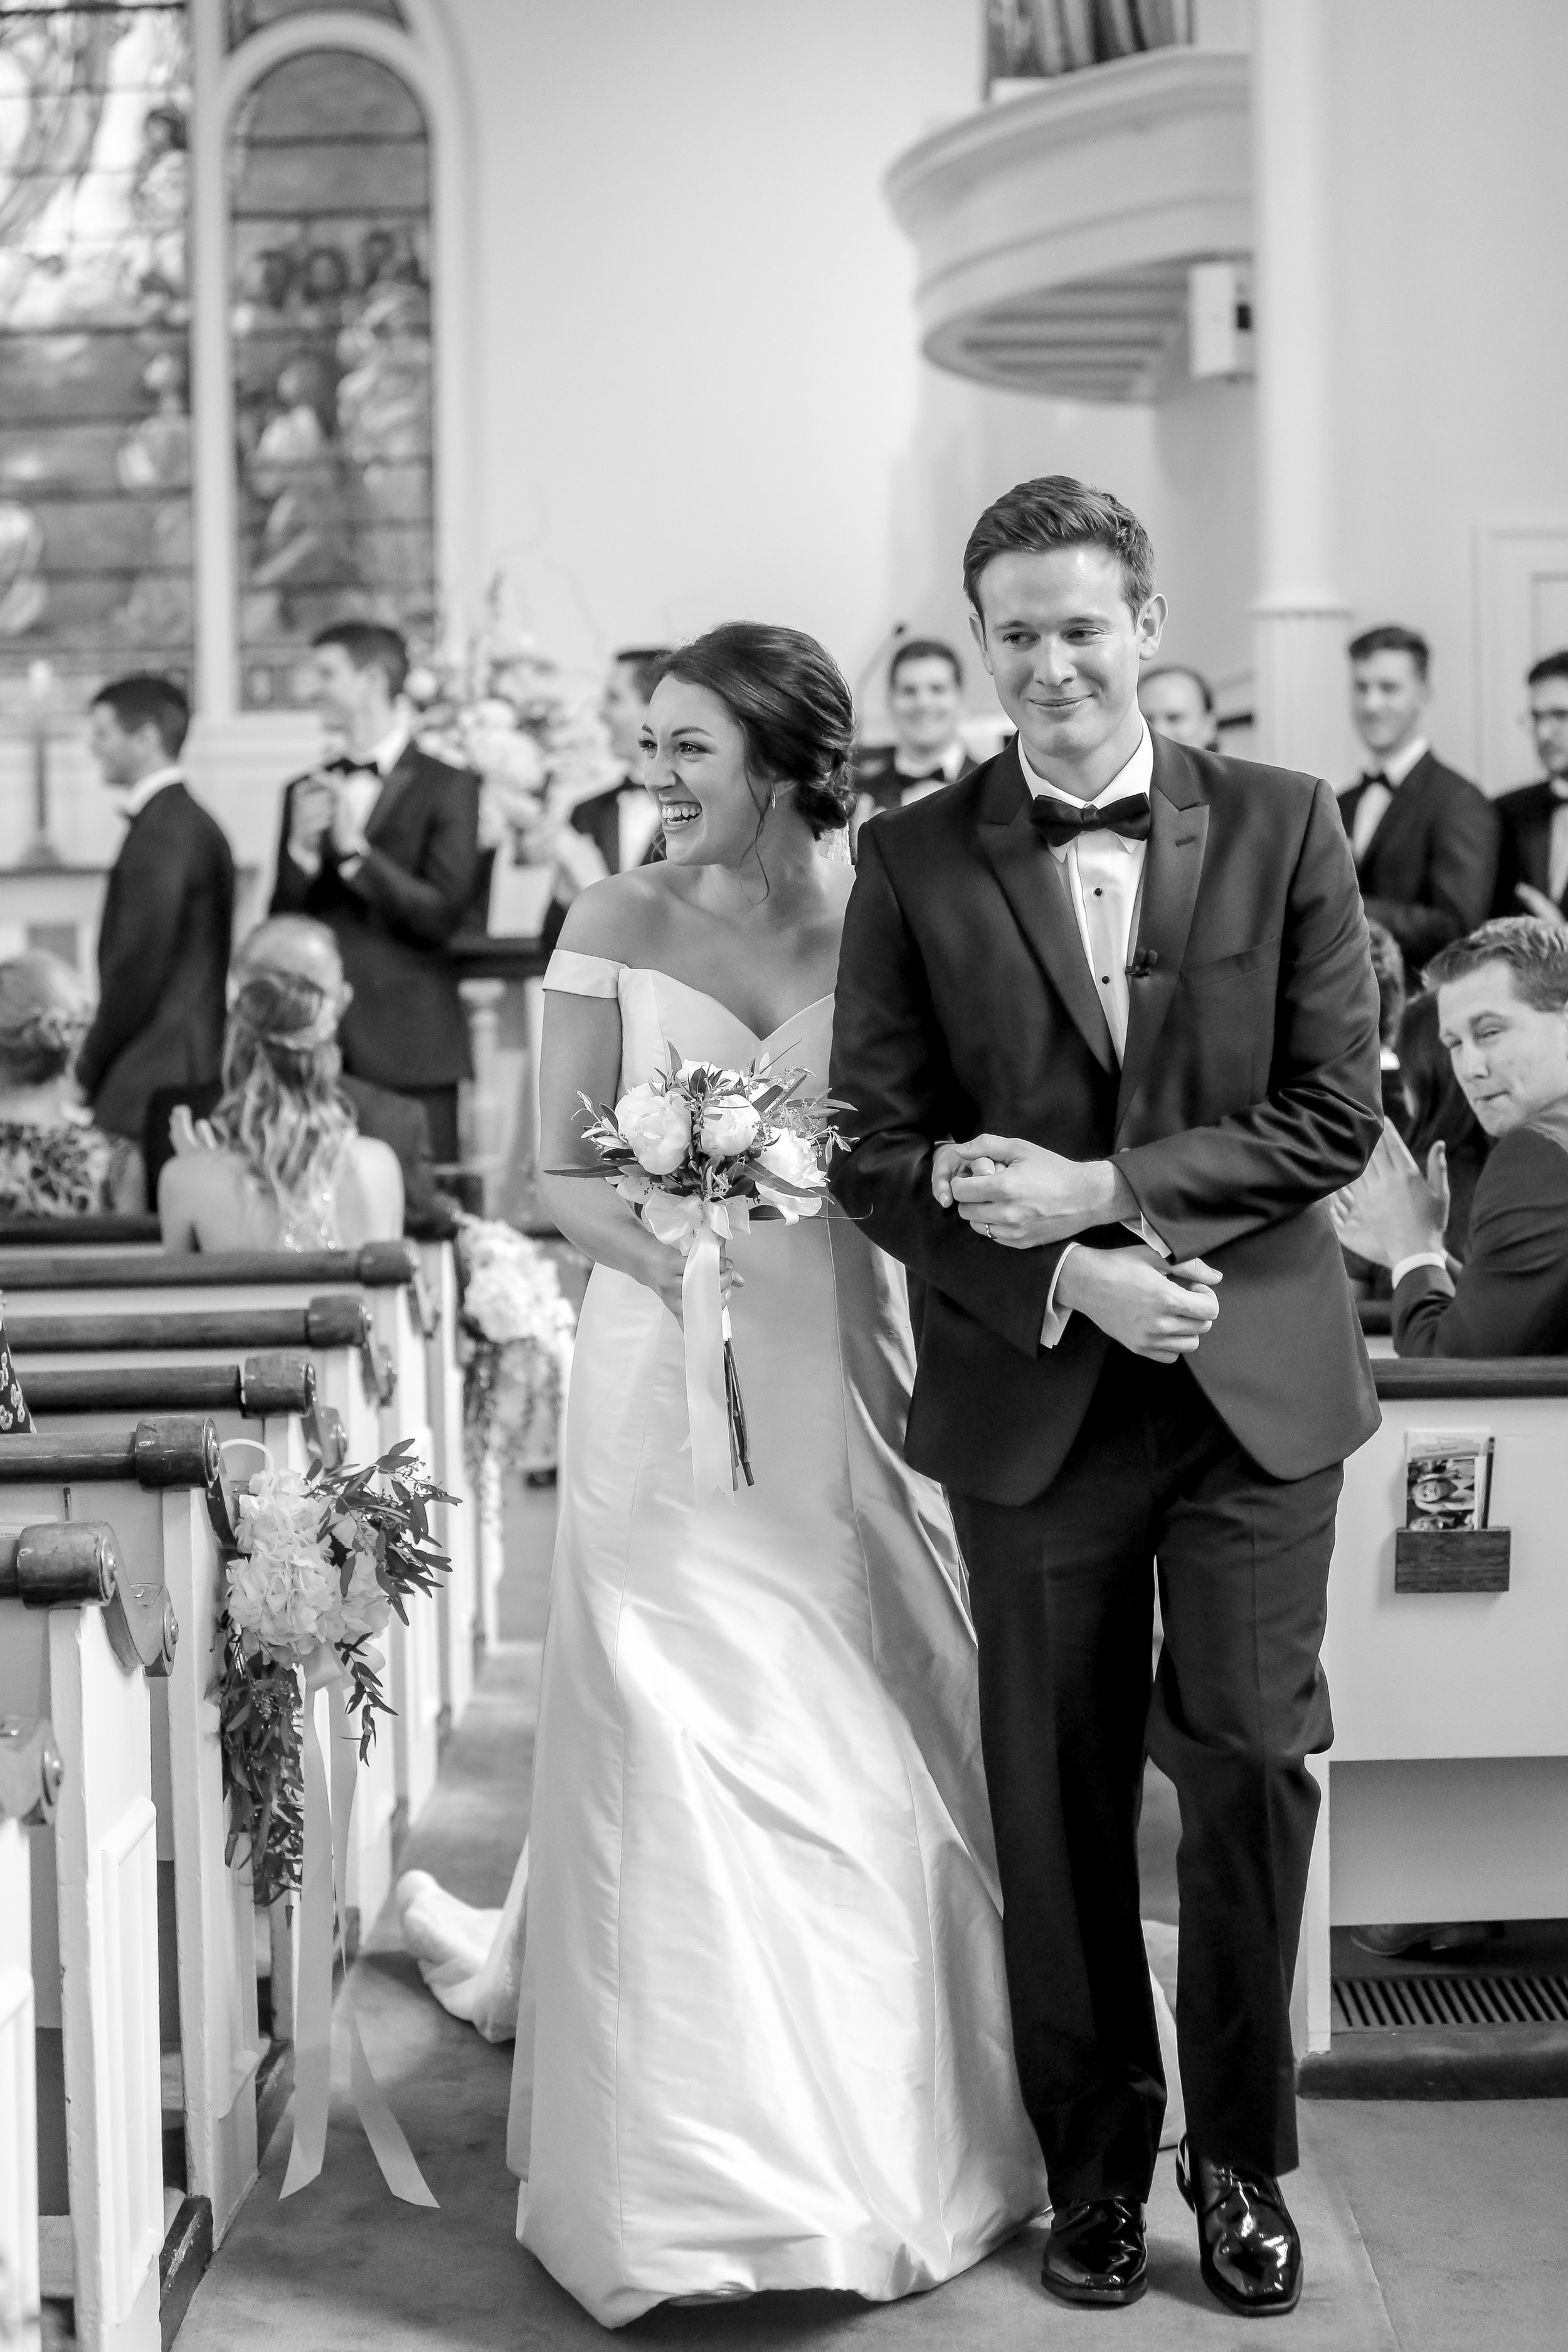 Jeremie_Barlow_Photography_Steffen_Sudyam_wedding_2018-506.jpg